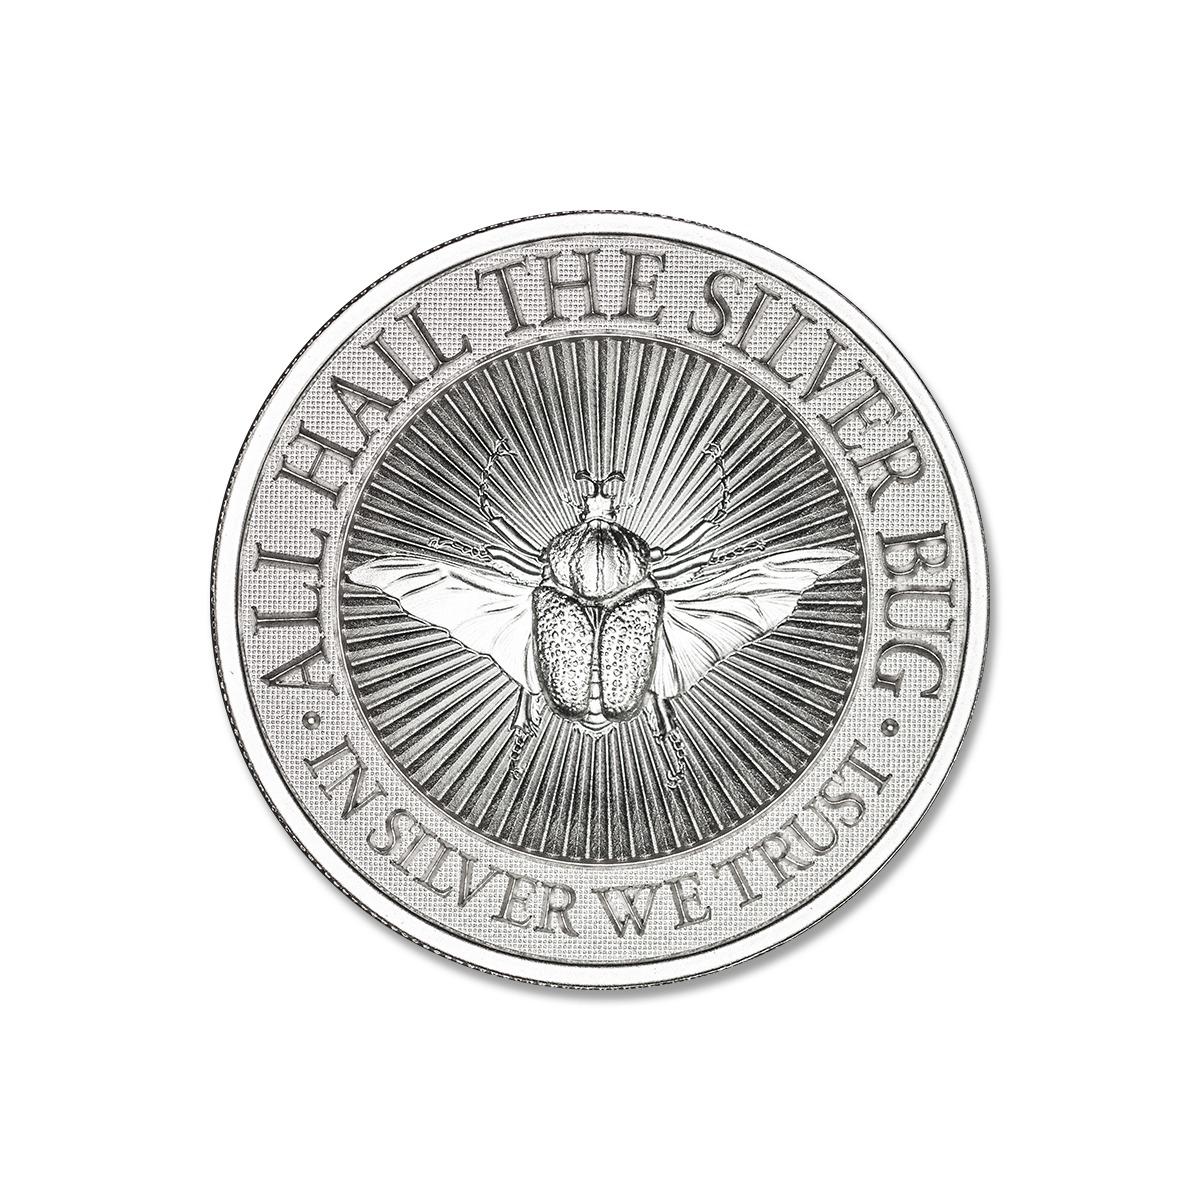 GOLIATHUS BEETLE – 2 TROY OUNCE – 39MM